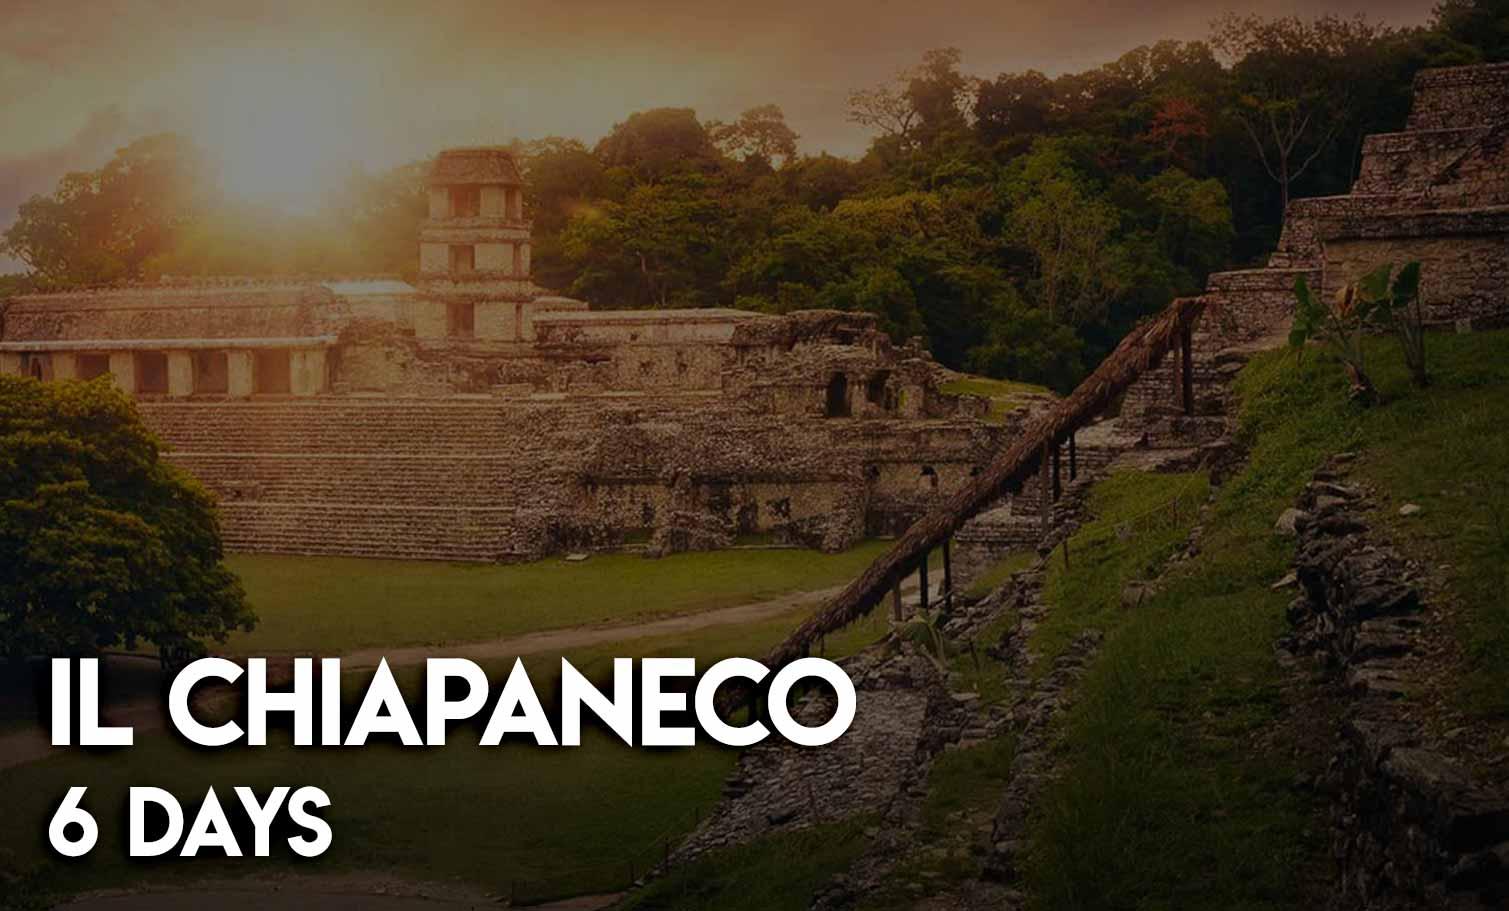 il-chiapaneco-6-days-tour-mayavacanze